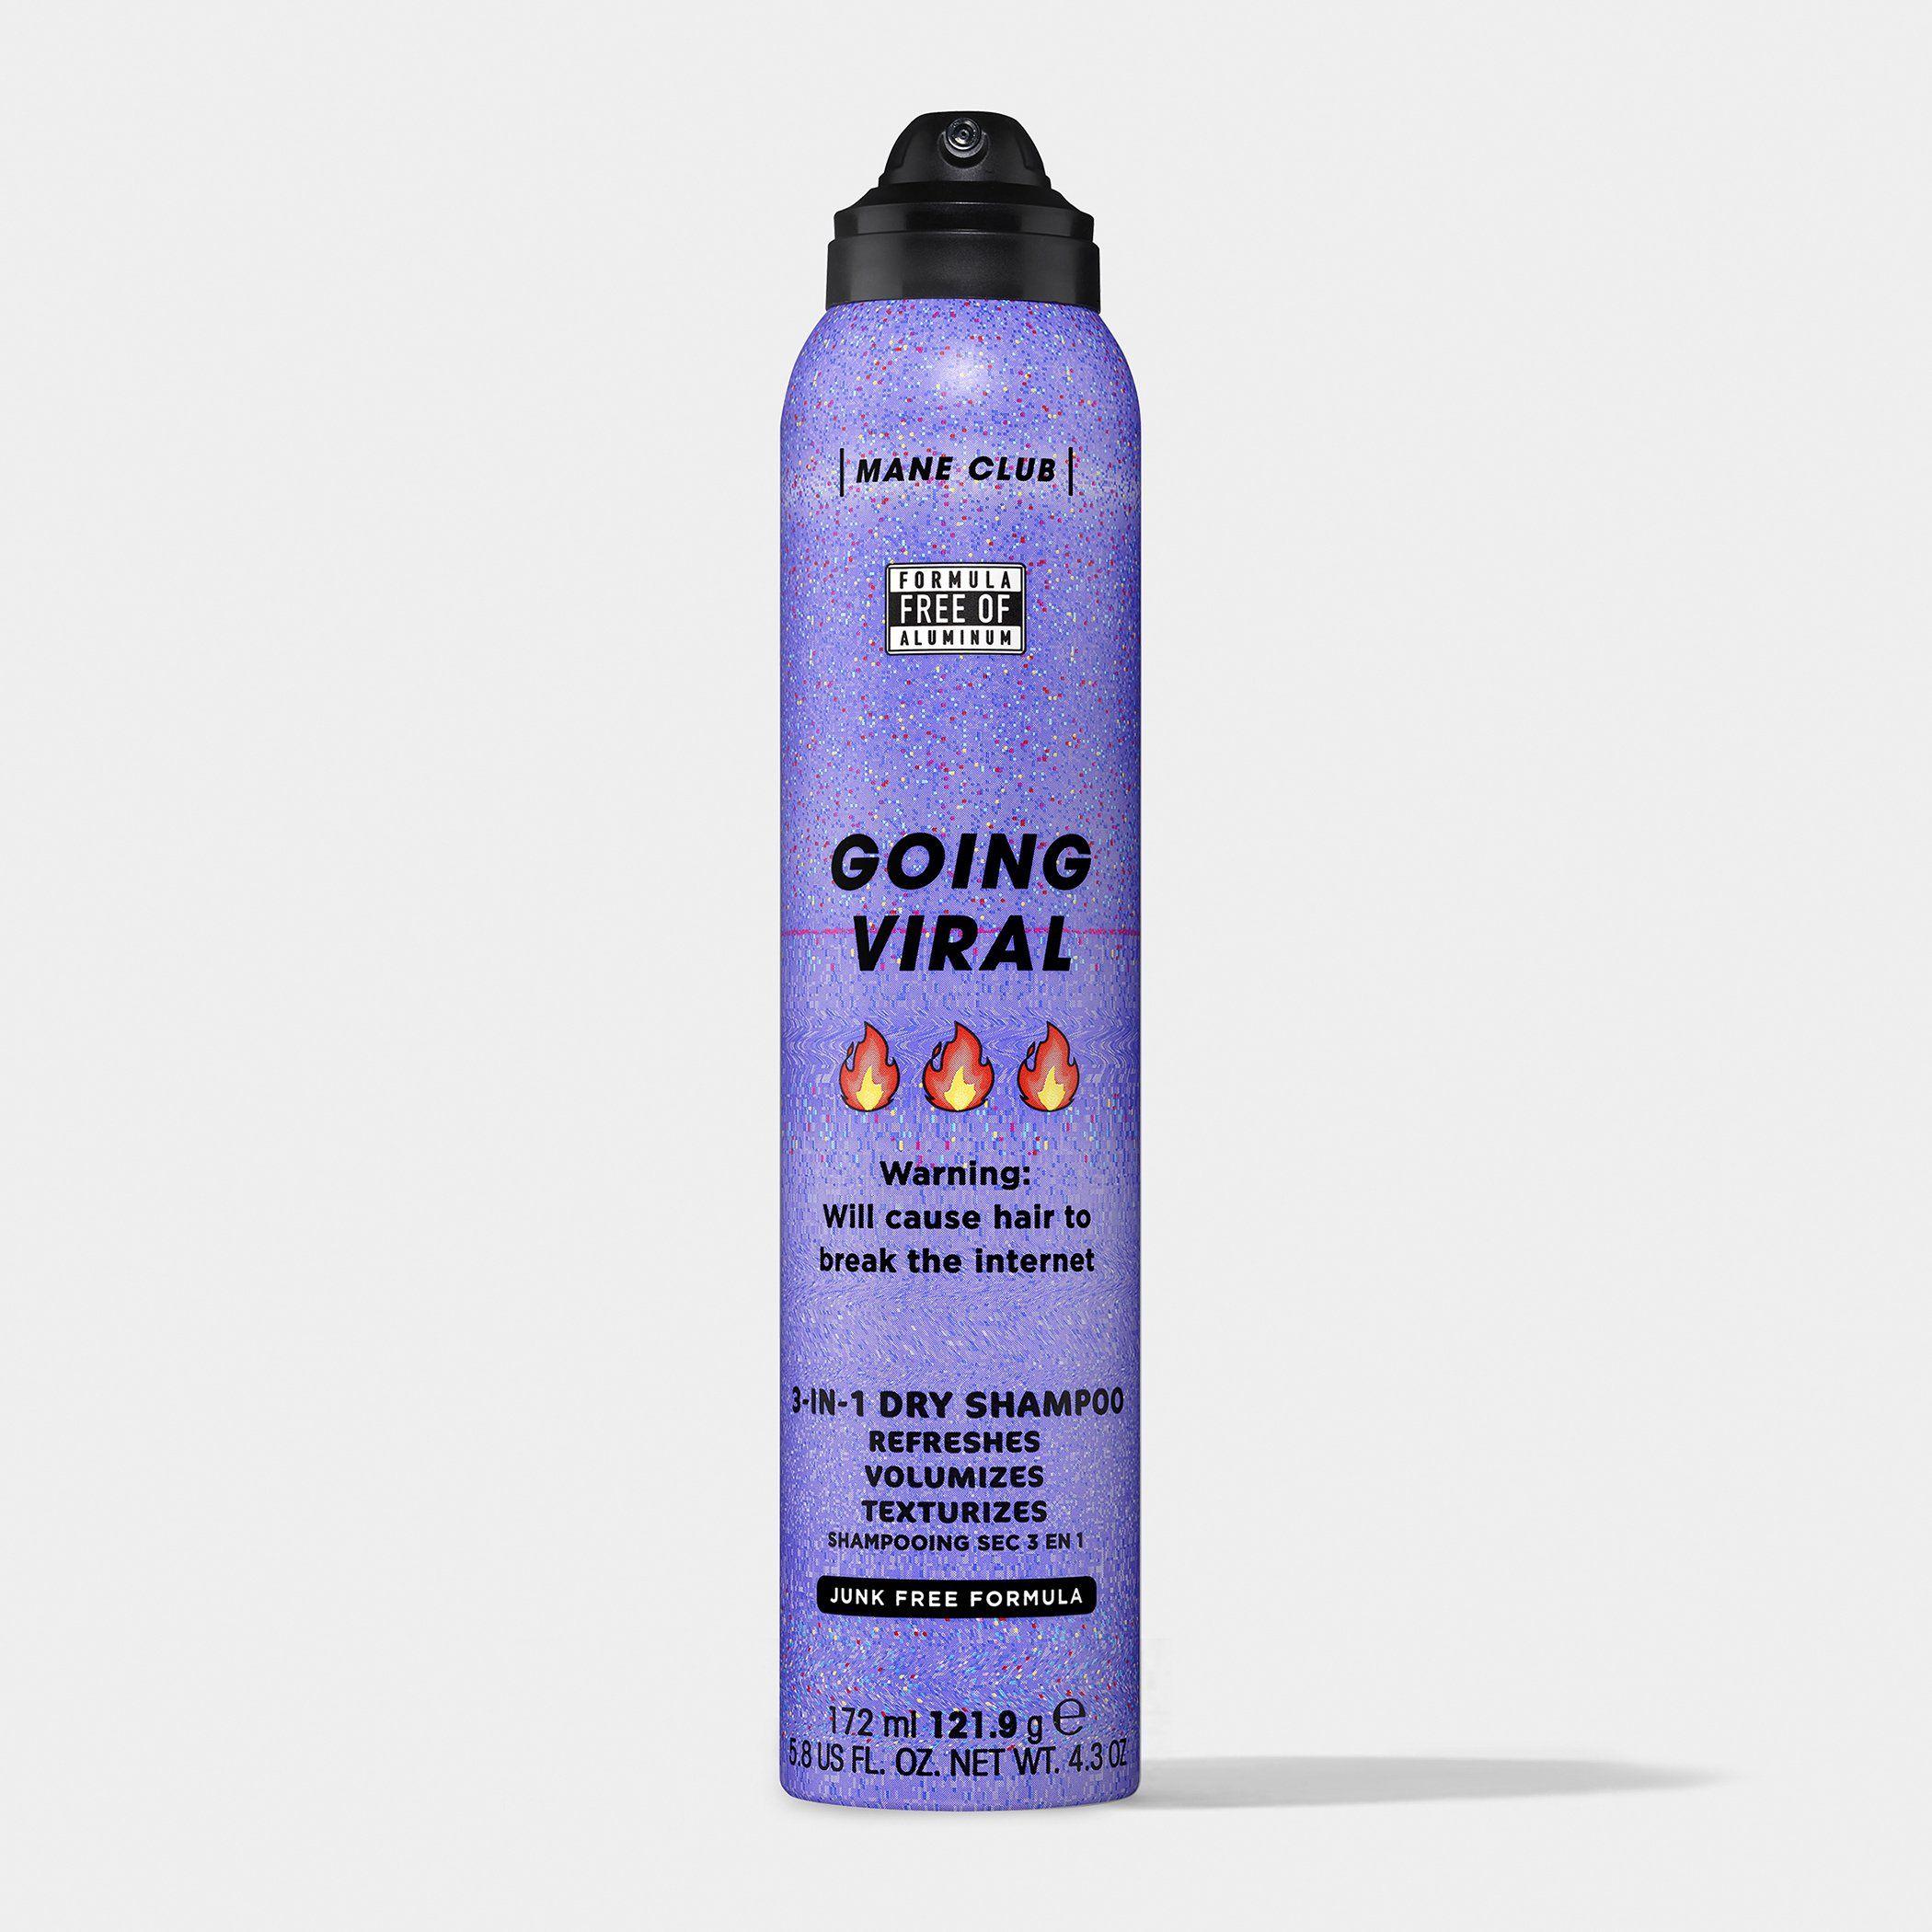 Going Viral Dry Shampoo Smooth Hair Mask Moisturizing Hair Mask